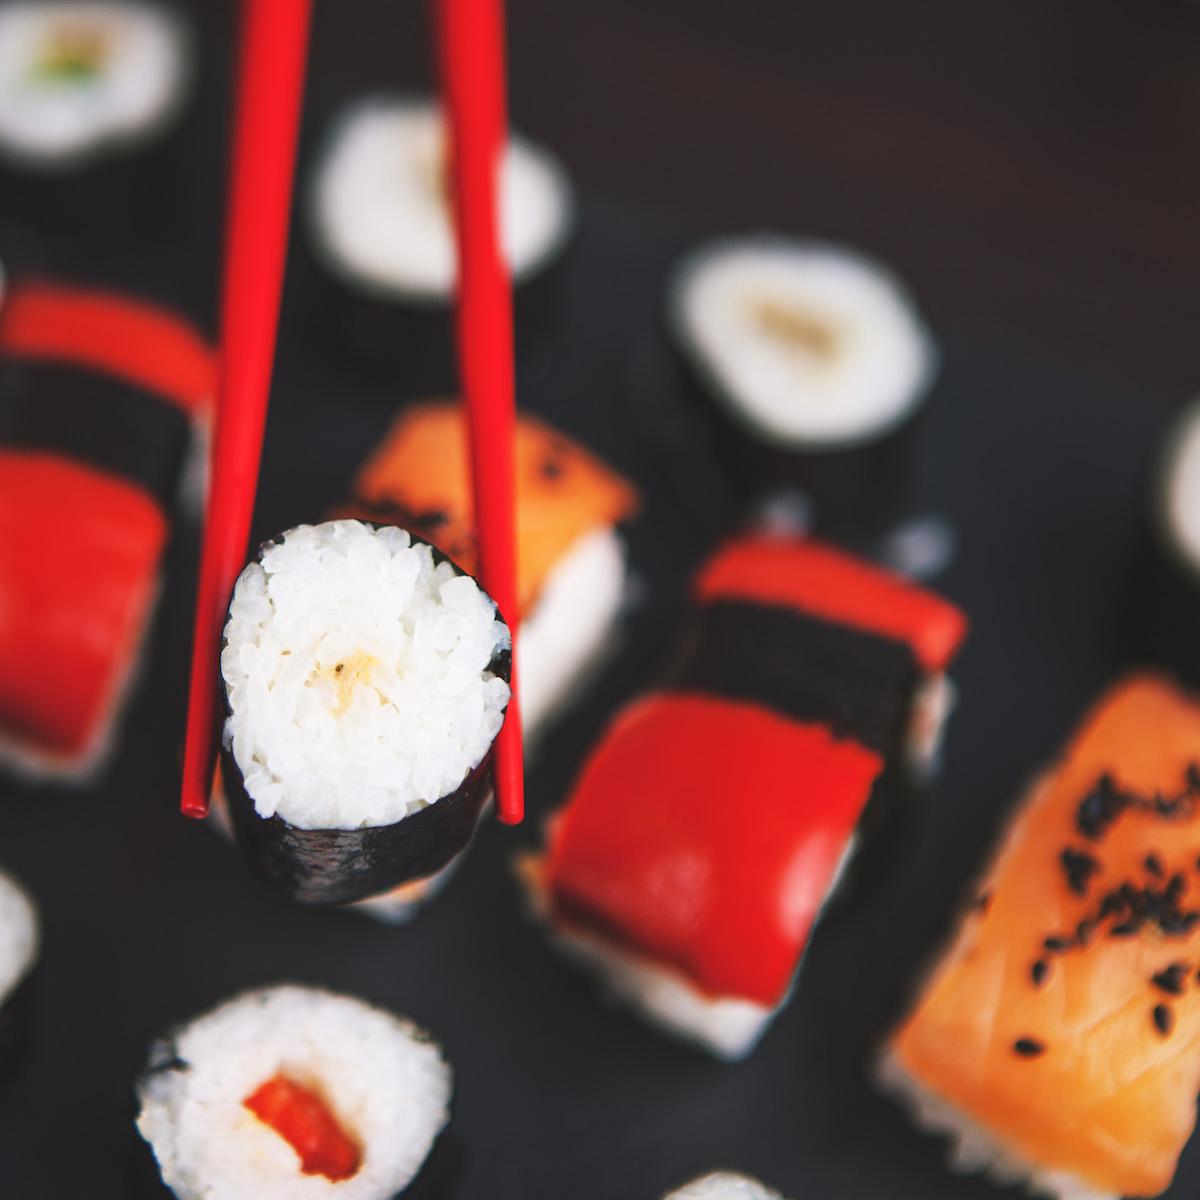 Kushi Tei of Tokyo Sushi Lunch Top 10 Sushi Restaurants in München